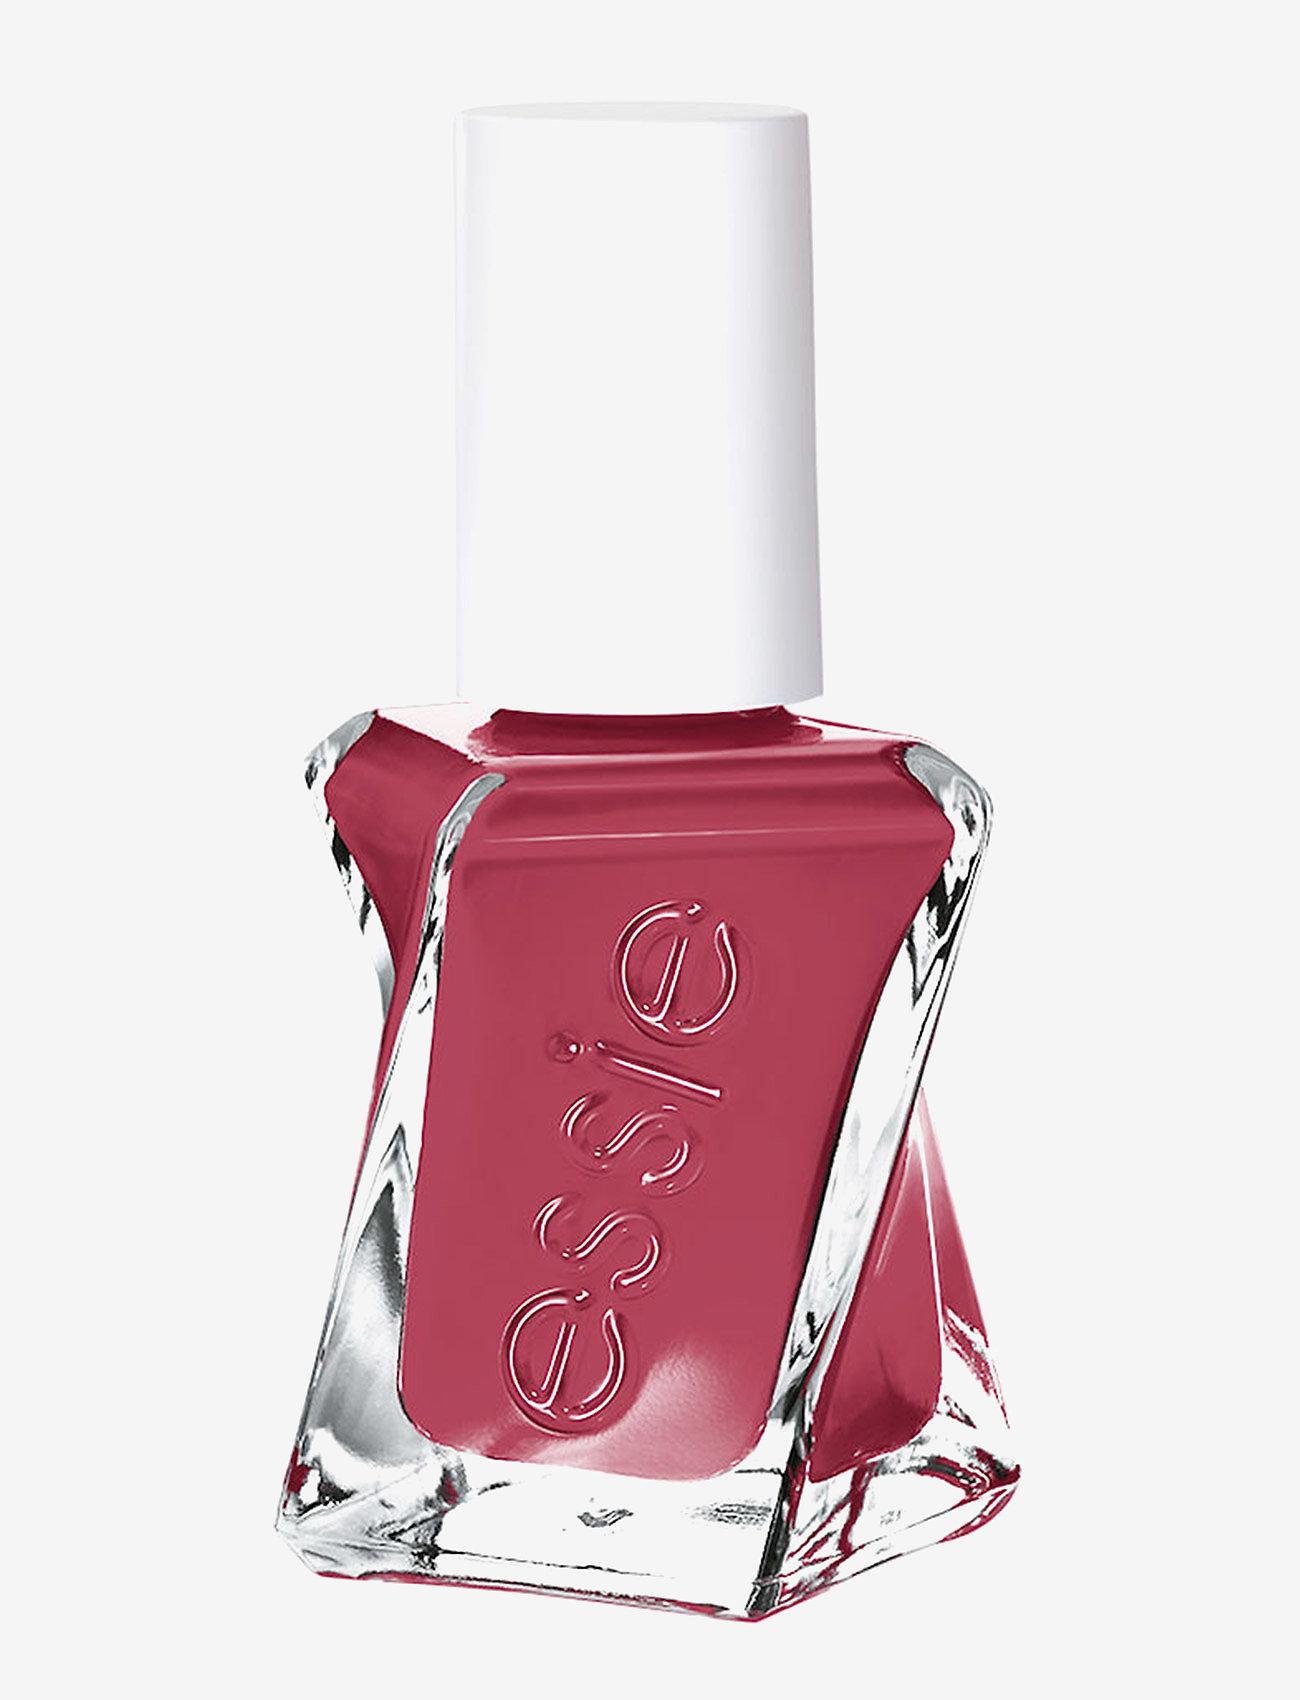 Essie - Essie Gel Couture 340 Drop the Gown - gellack - 340 drop the gown - 0